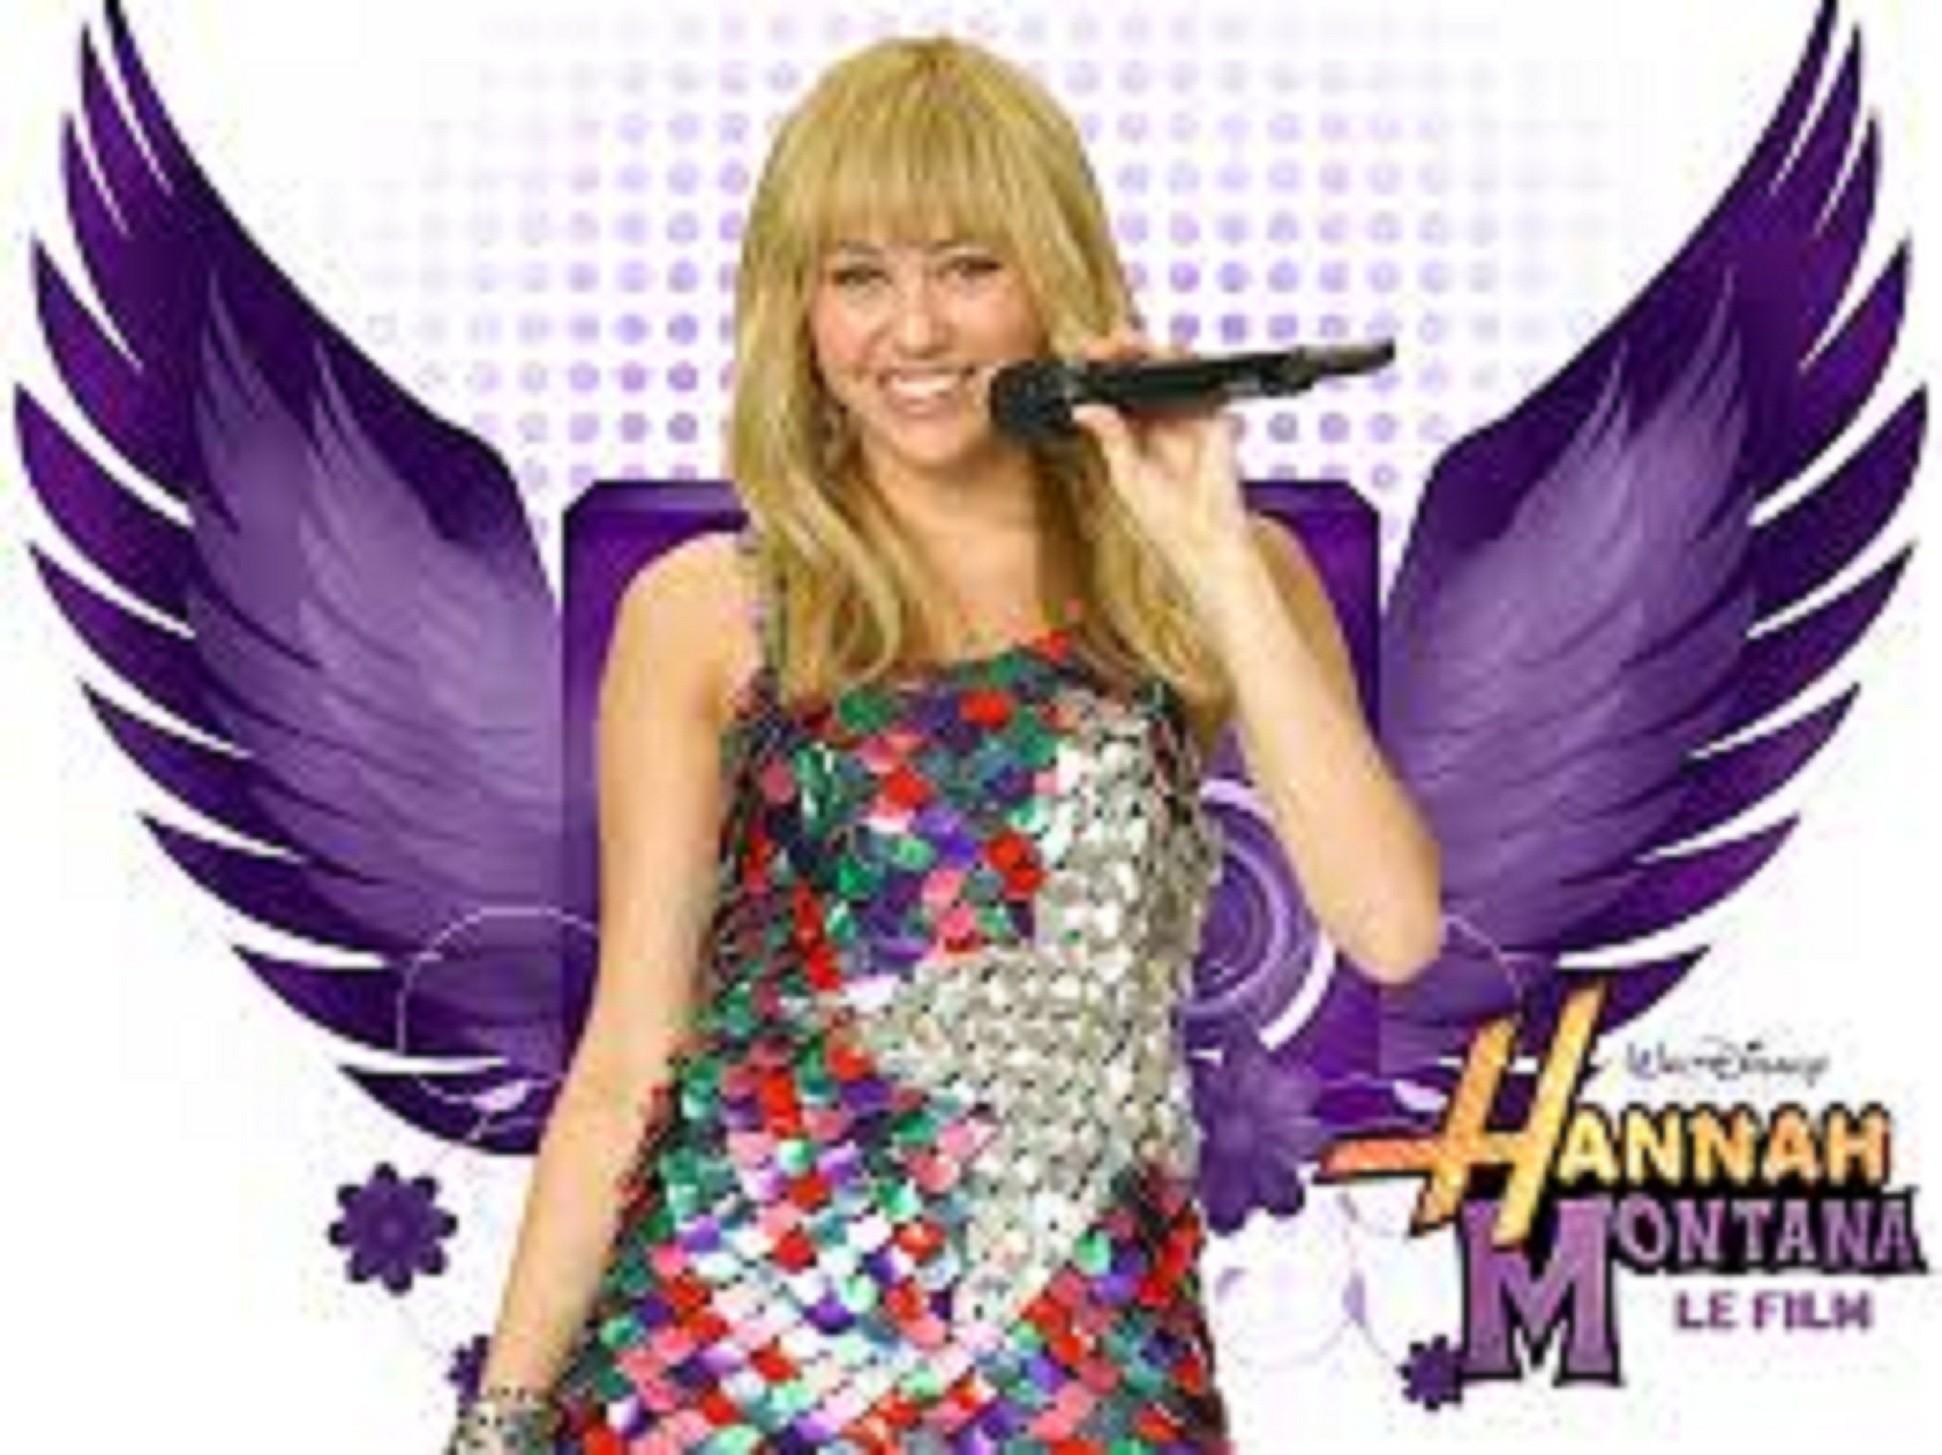 hannah montana the movie download hd